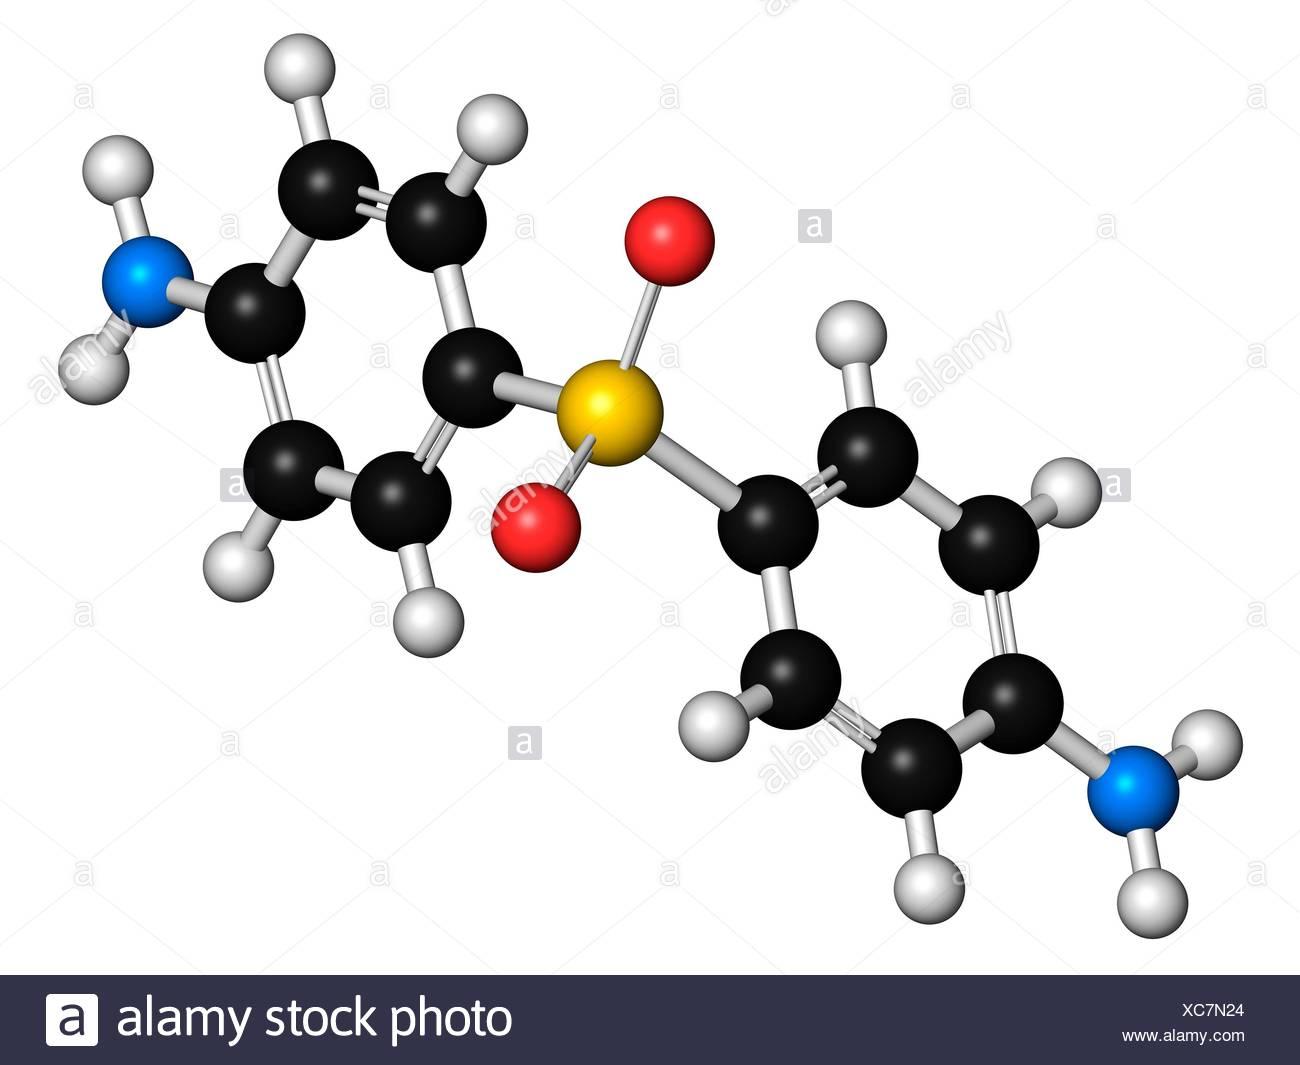 Dapsone antibacterial drug molecule - Stock Image